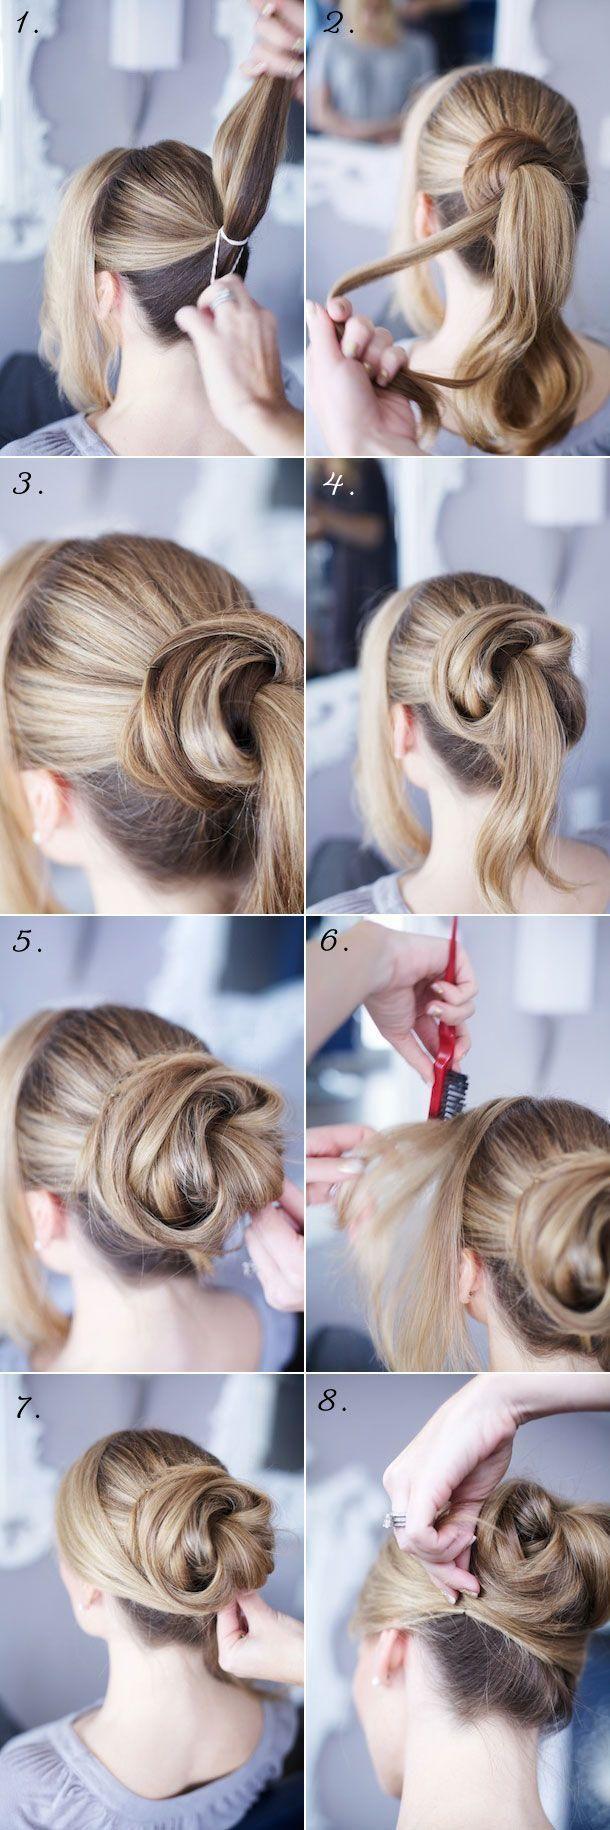 Fast hair styles